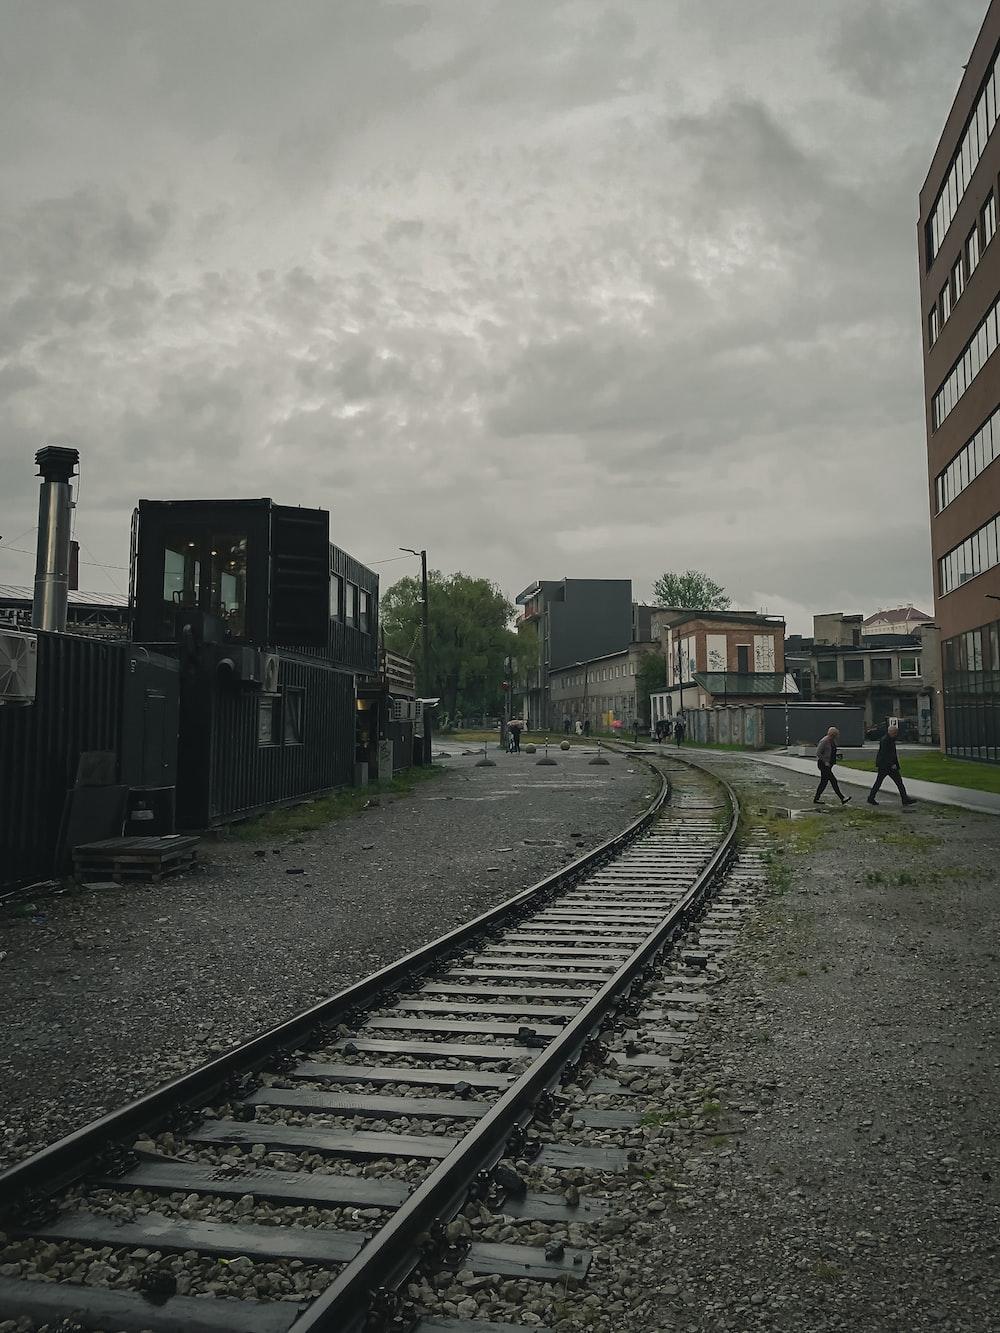 train rail near building during daytime